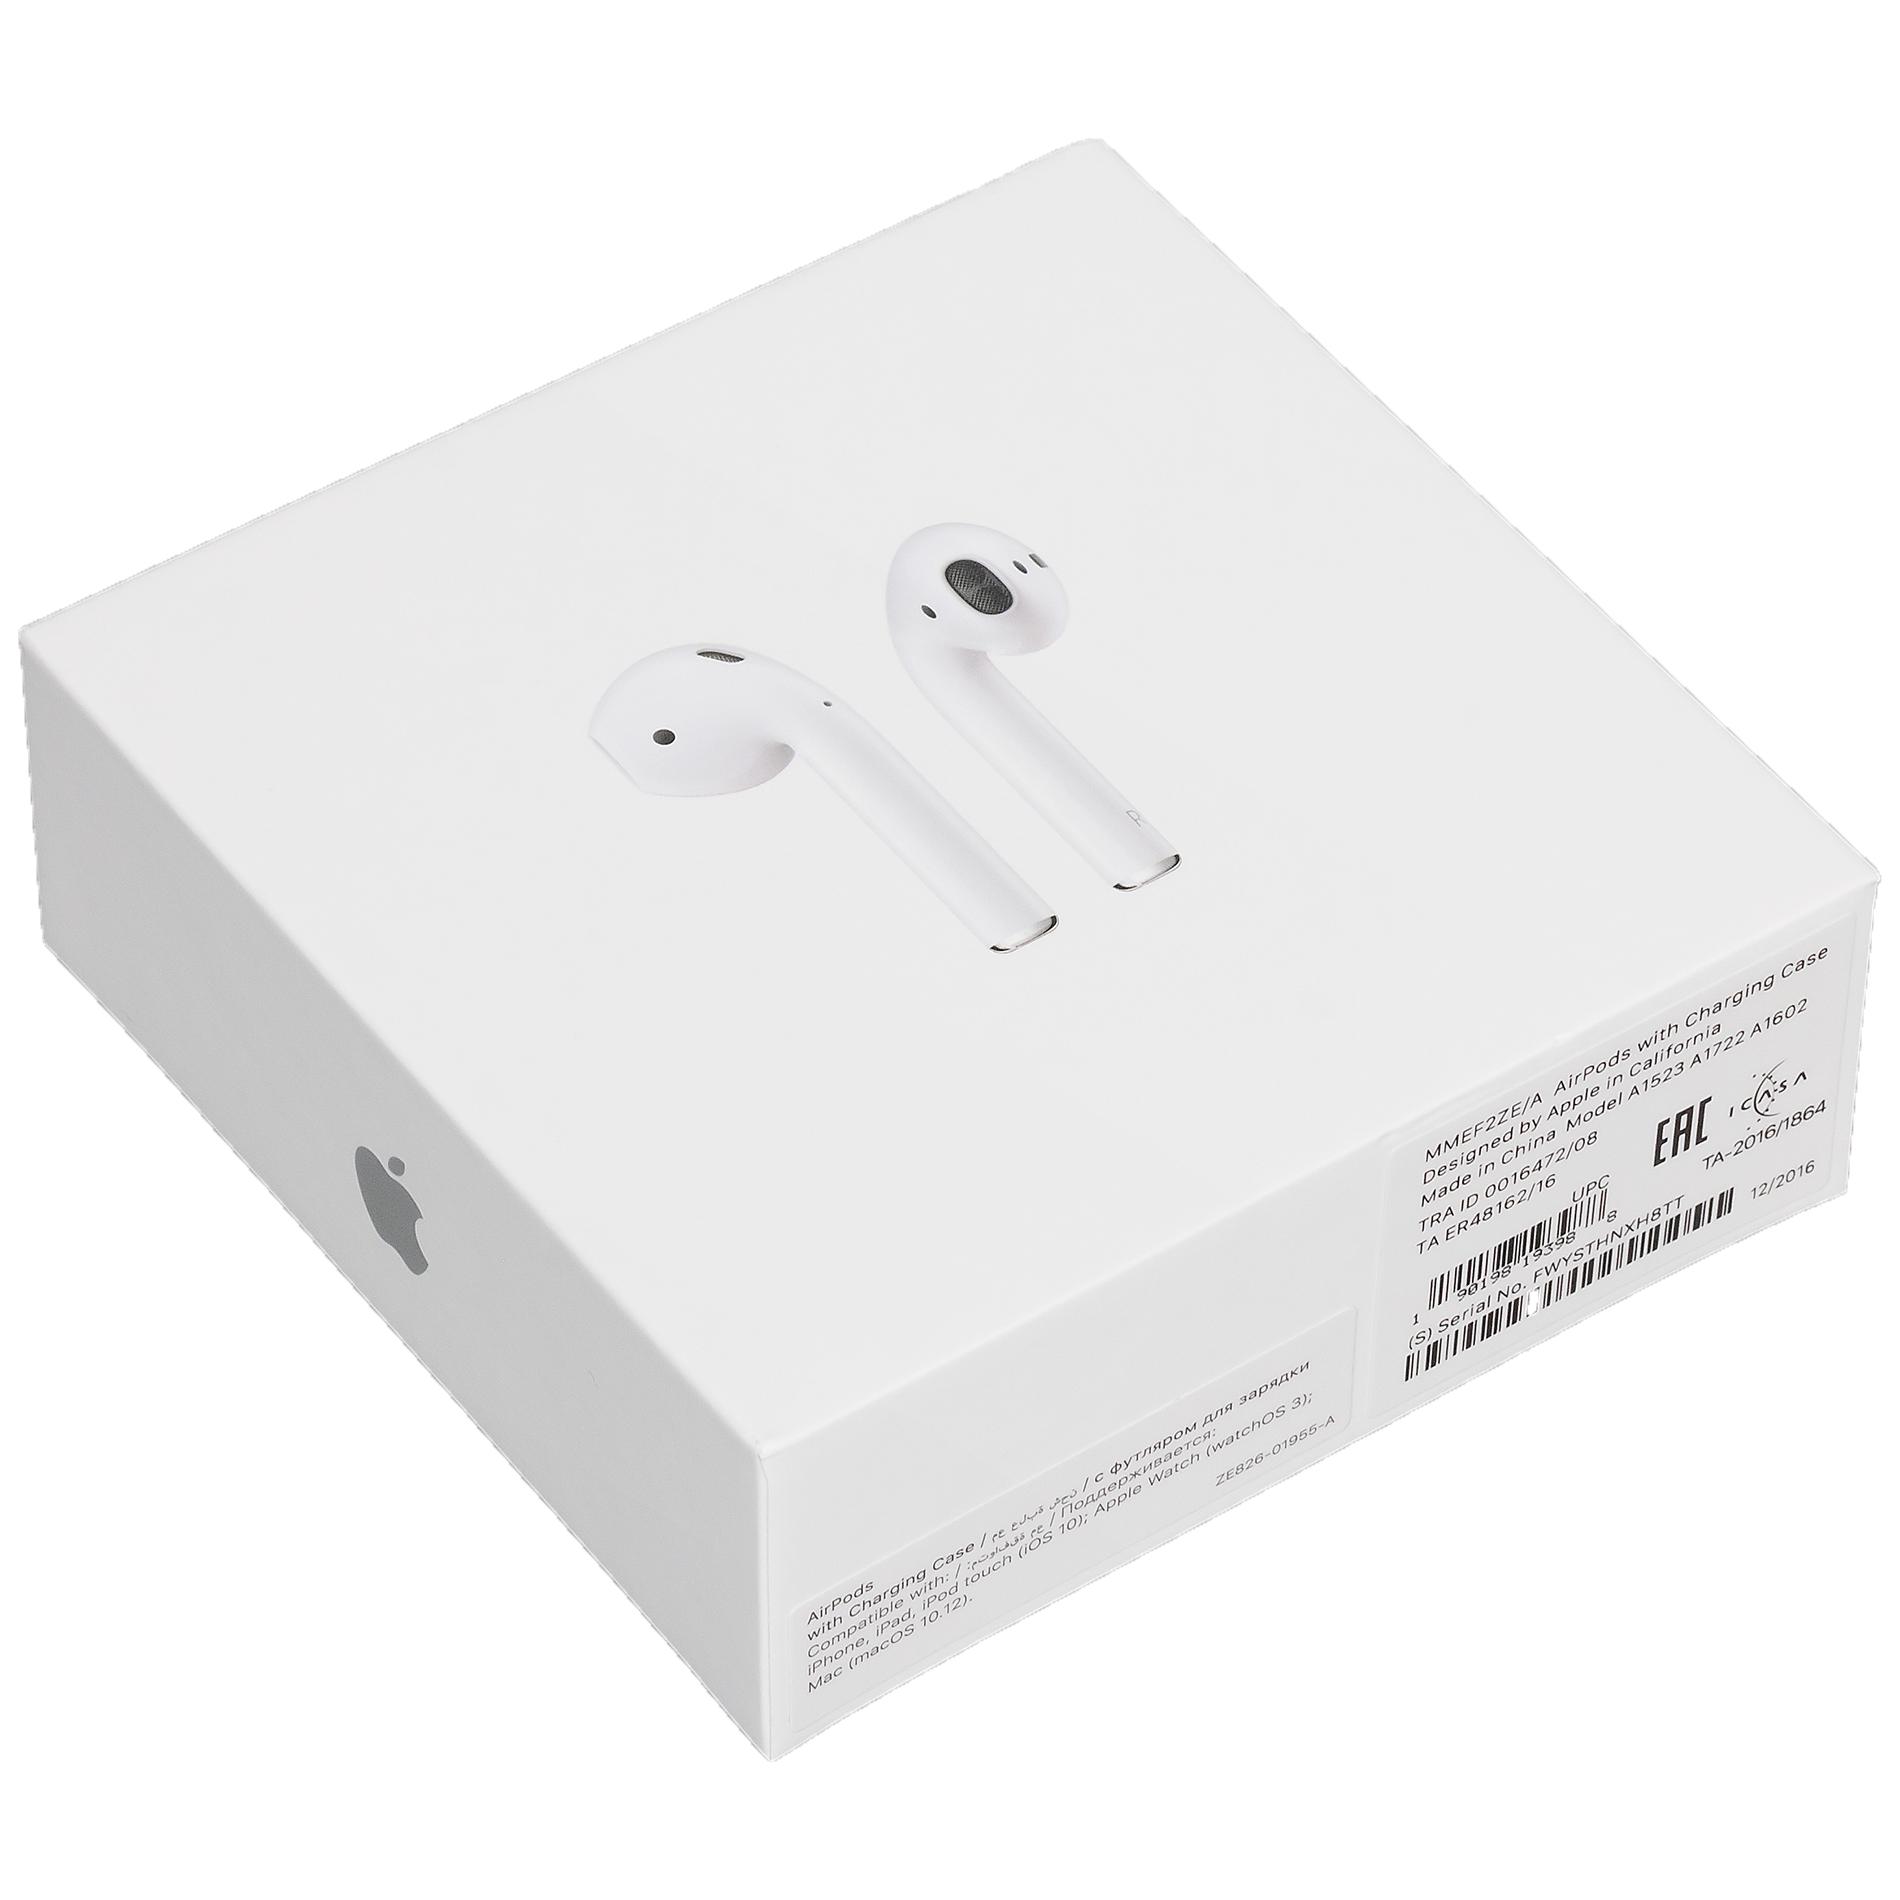 Оригинальная коробка Apple AirPods